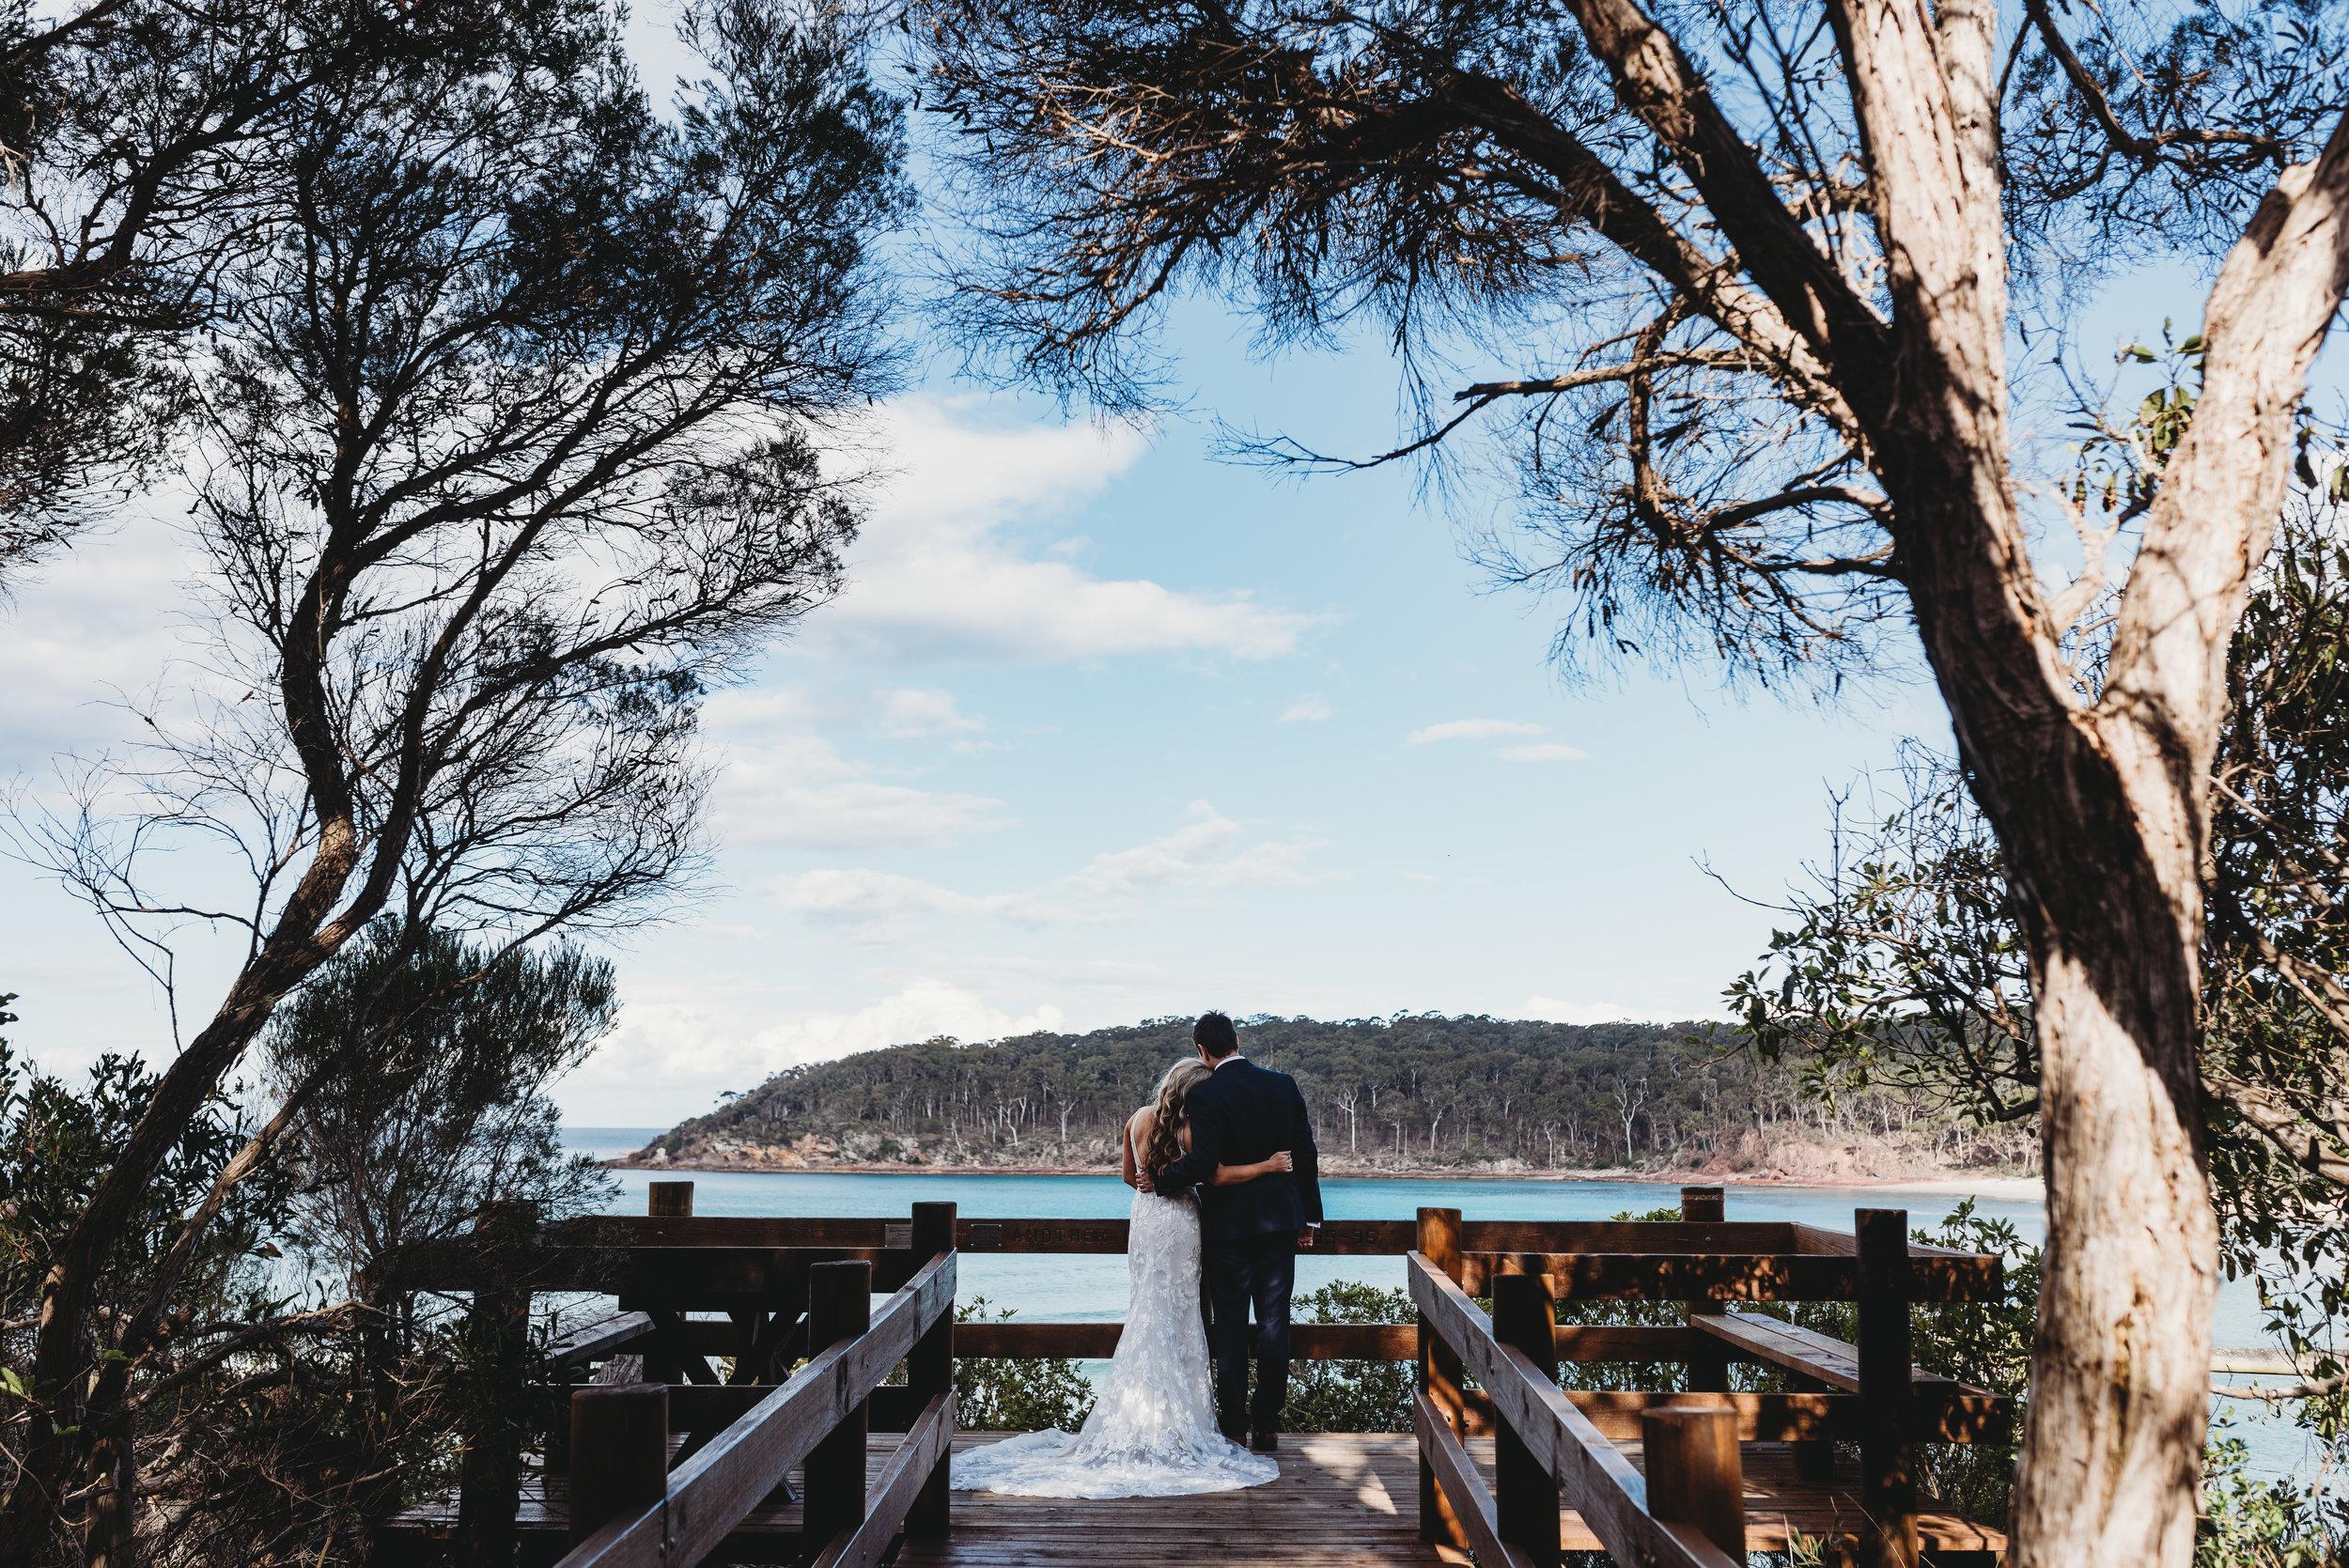 Amy & Troy - Pambula River Mouth & Merimbula Aquarium Wedding    22nd December 2018